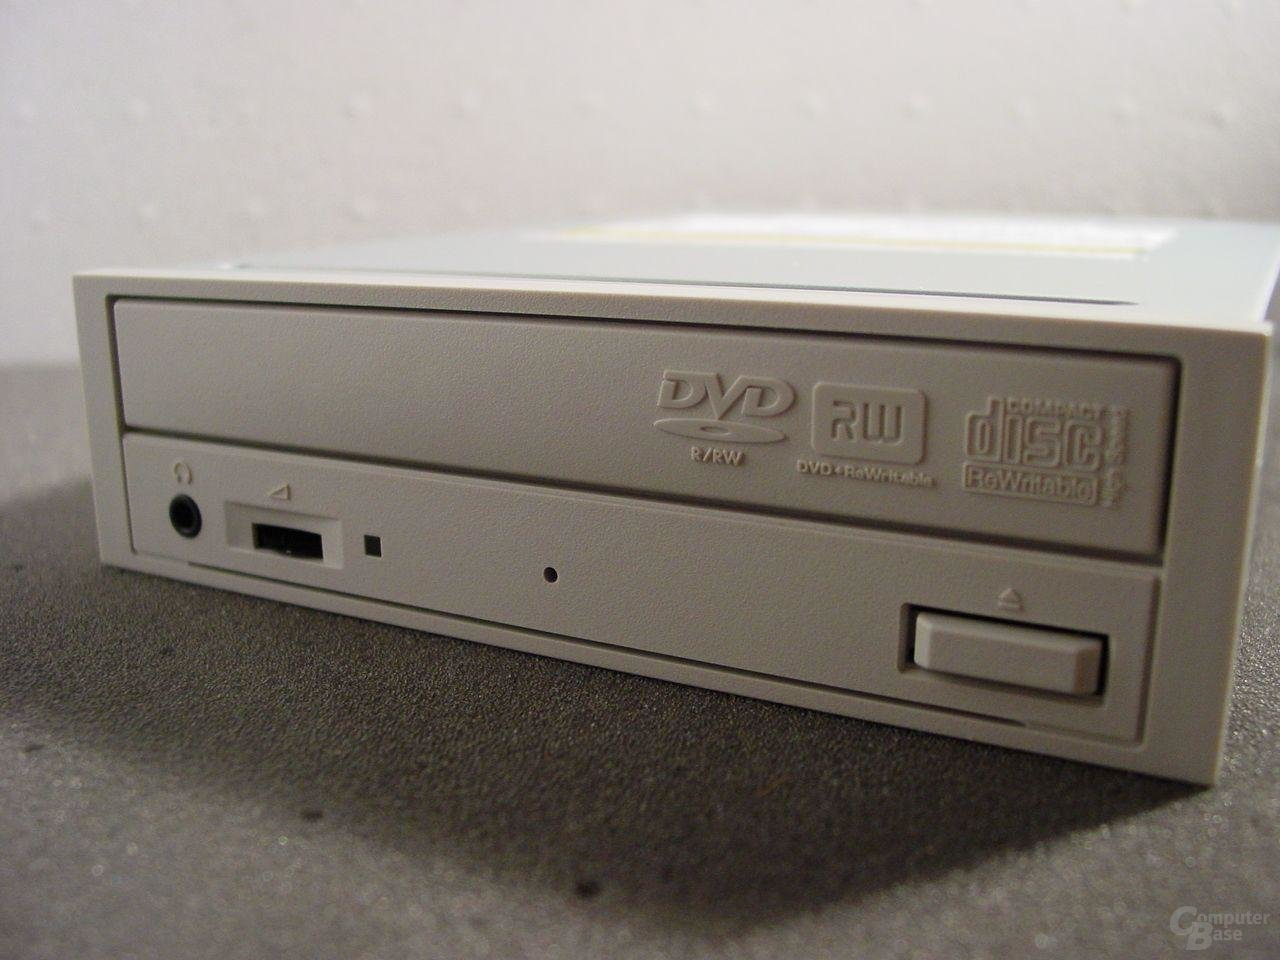 Traxdata RW 1300 Frontansicht